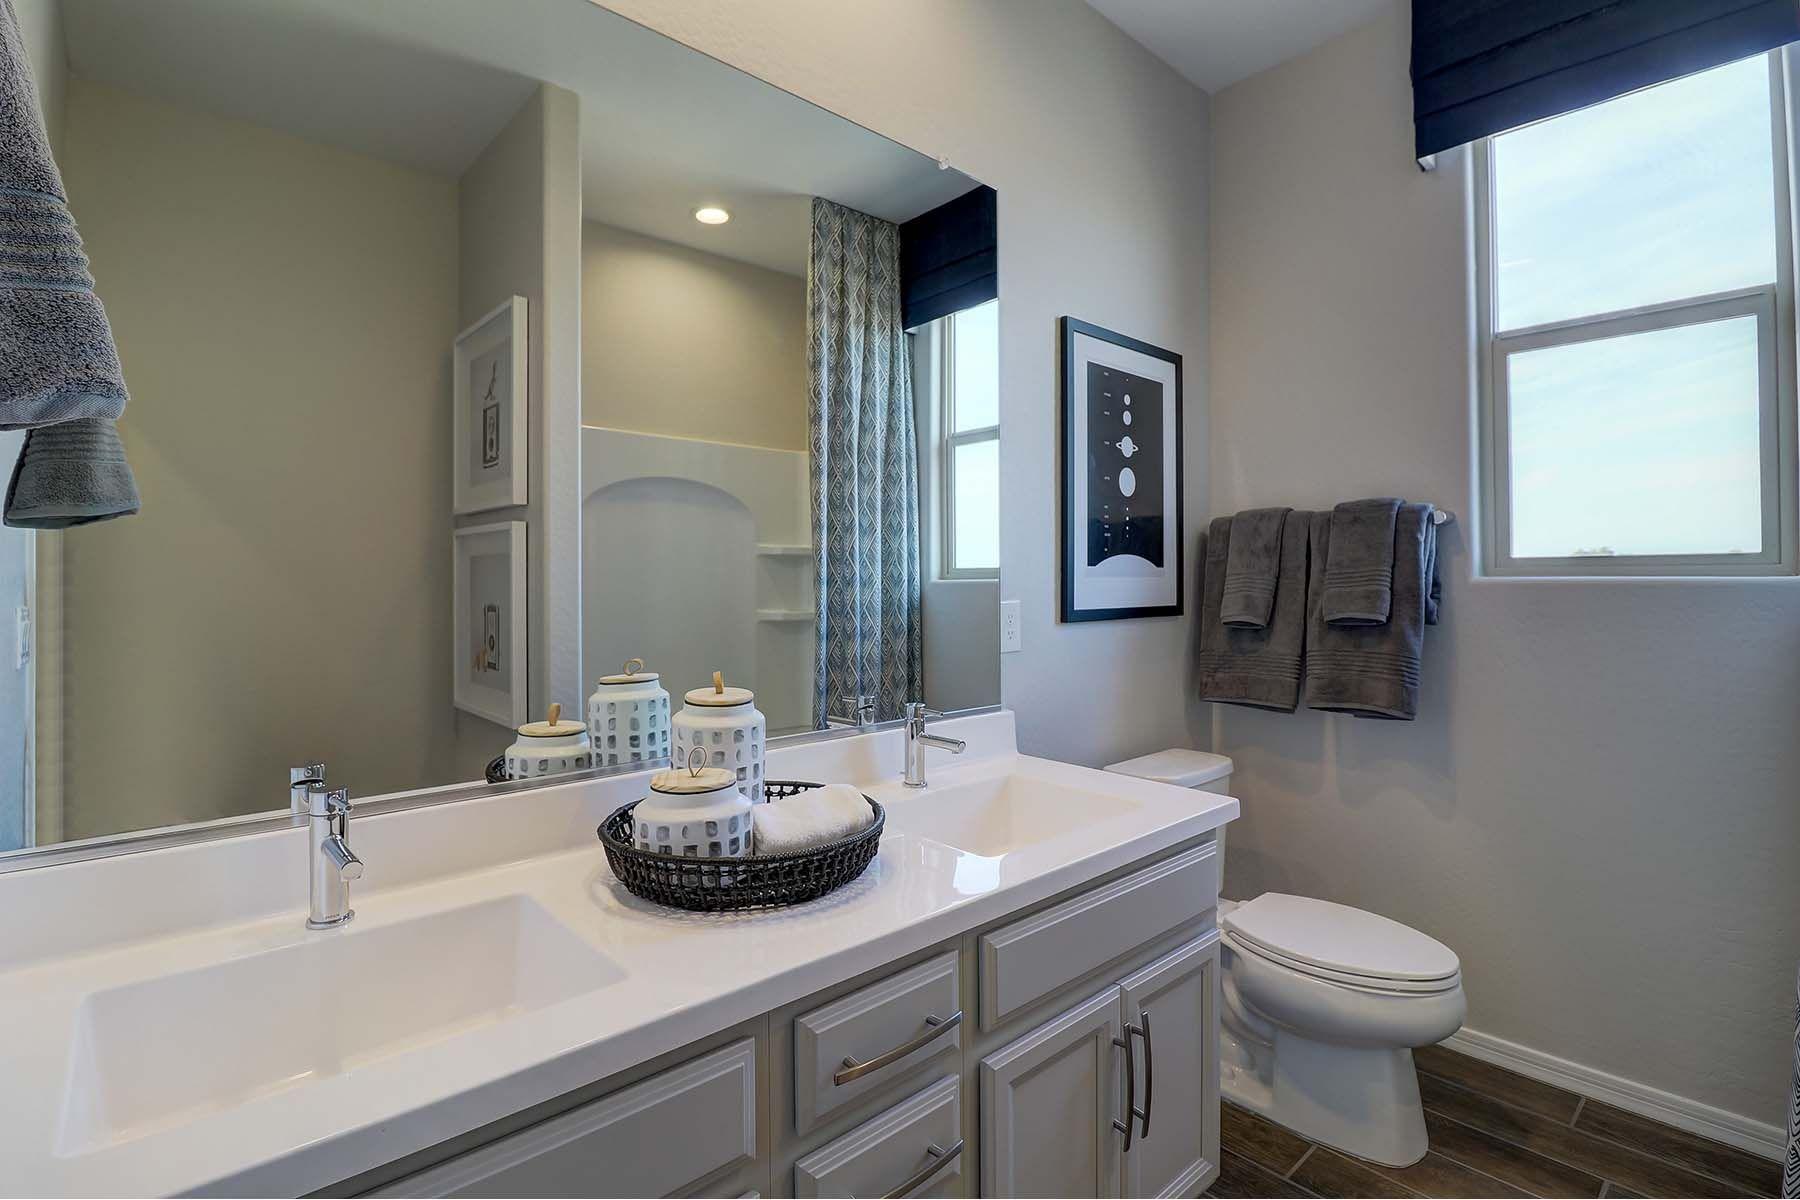 Bathroom featured in the Watson By Mattamy Homes in Phoenix-Mesa, AZ